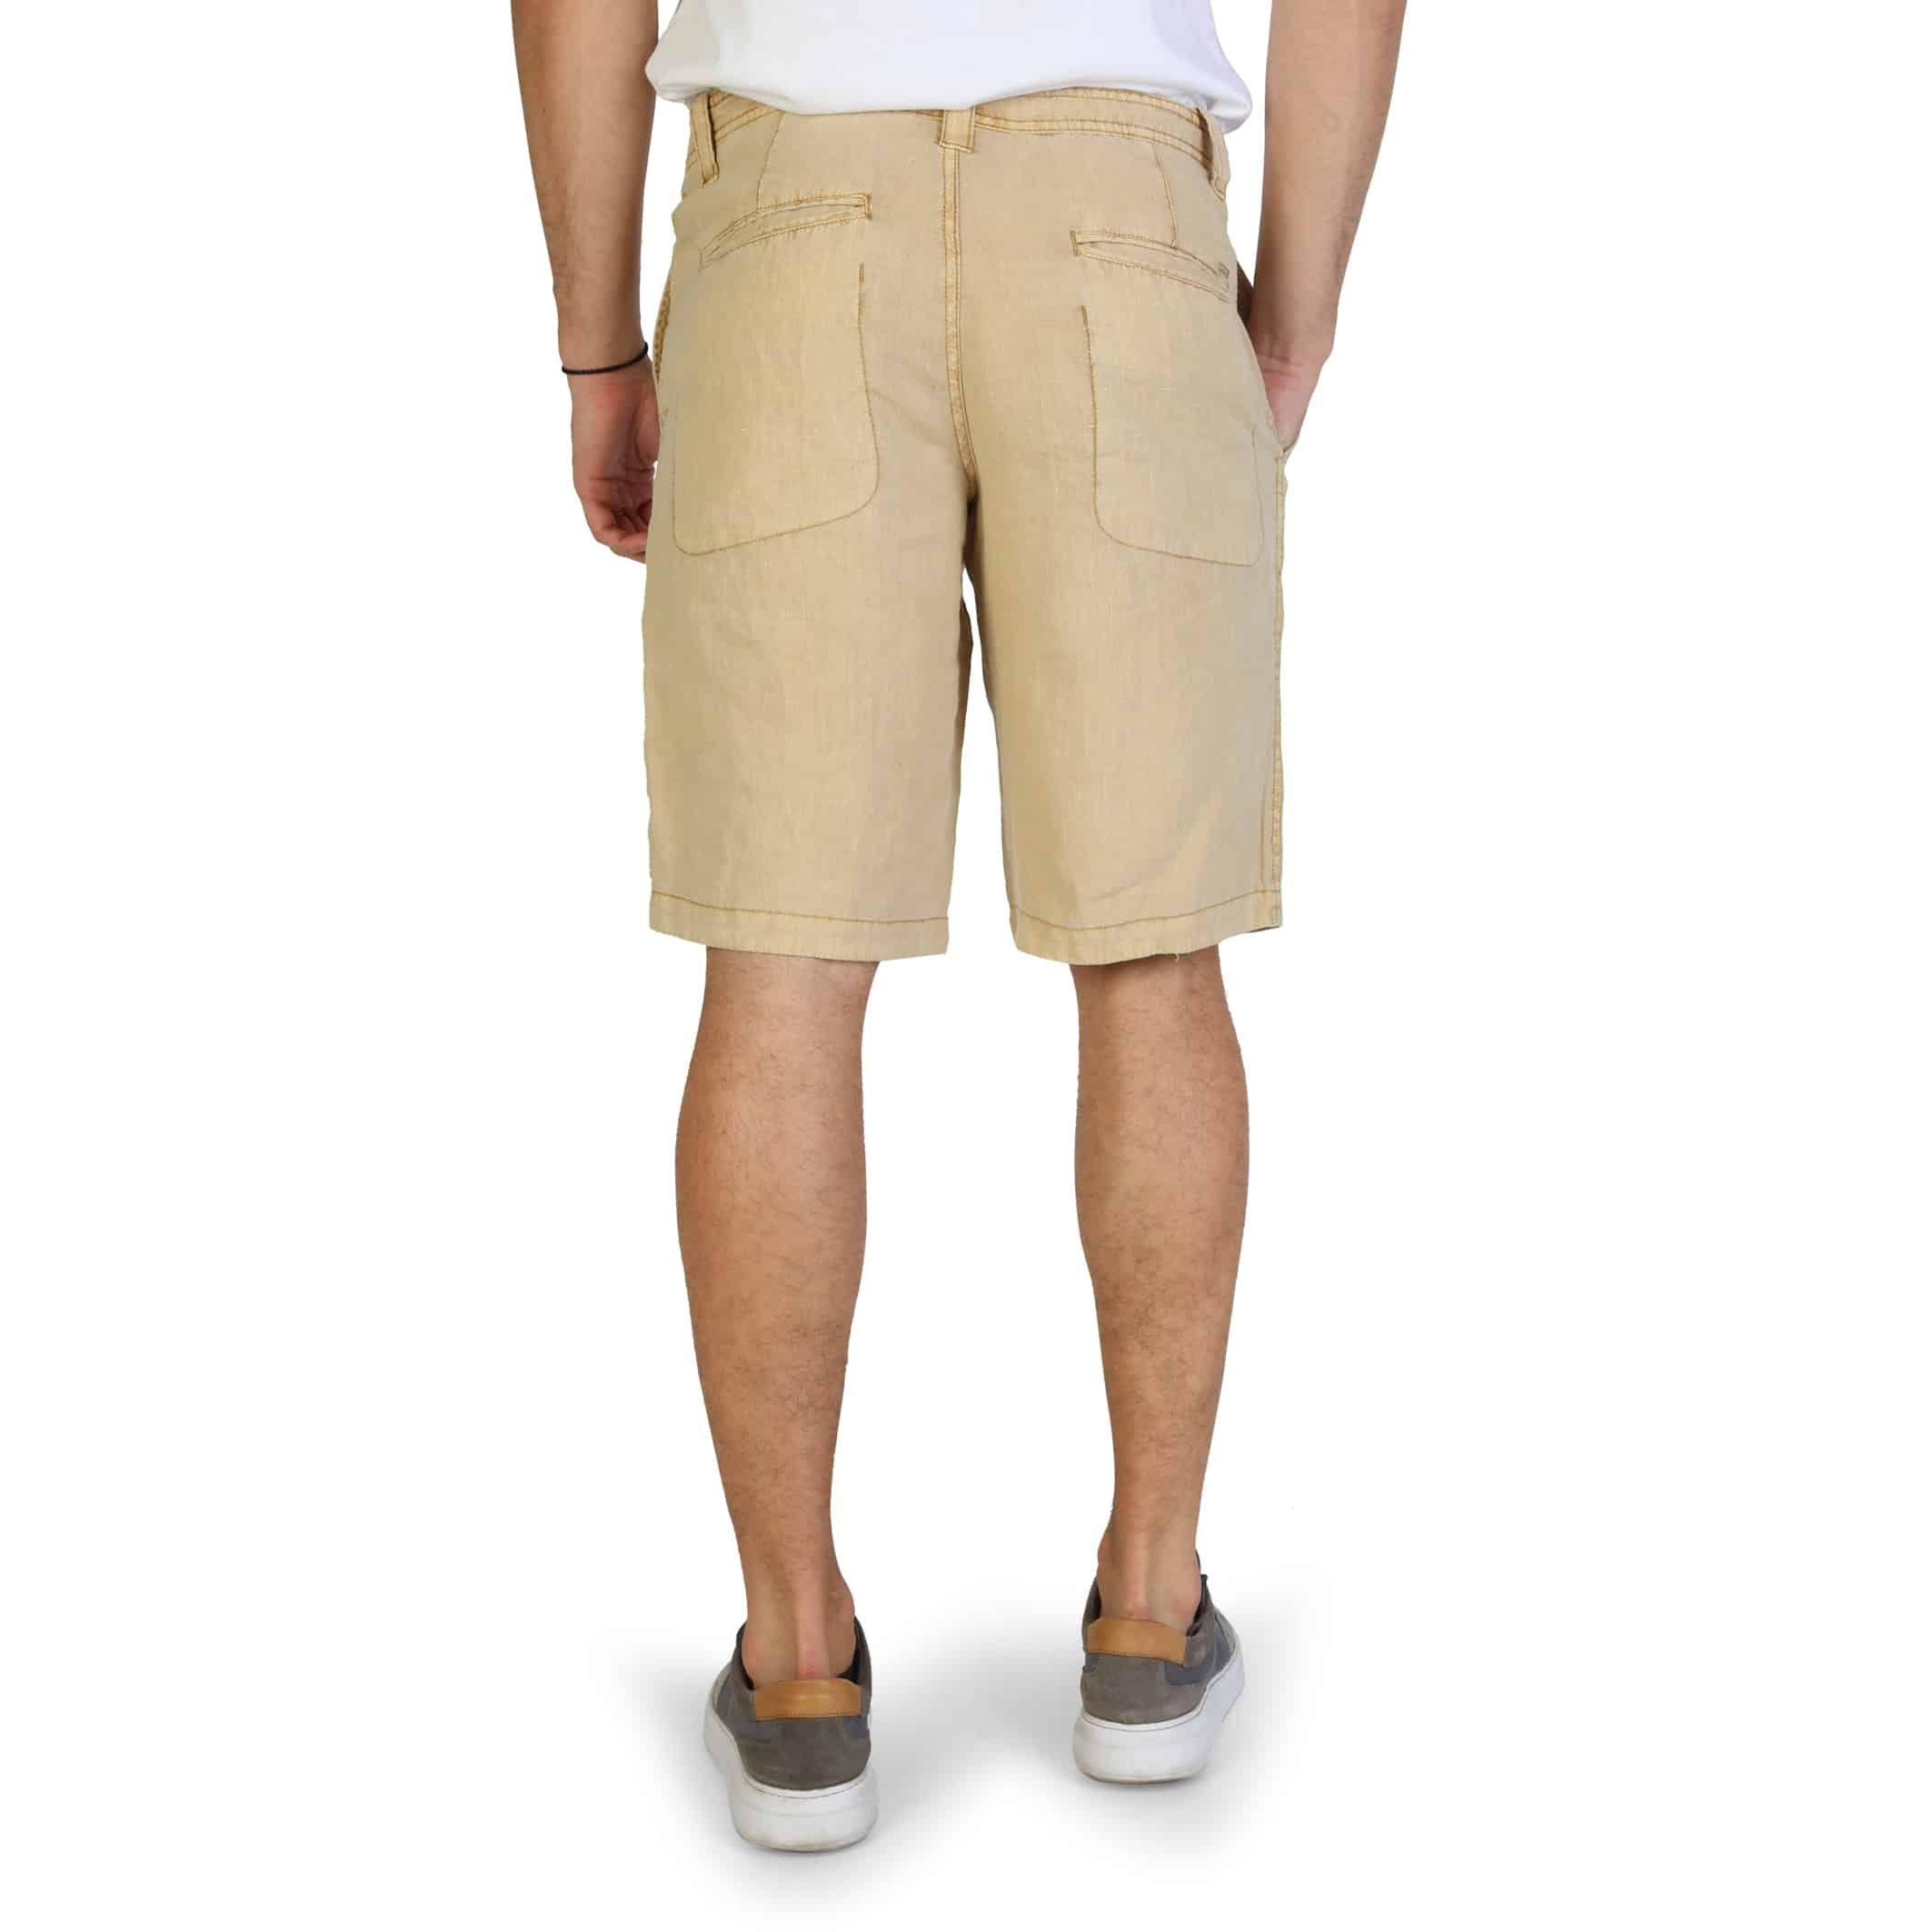 Bermuda Armani Jeans – 3Y6S75_6NDMZ